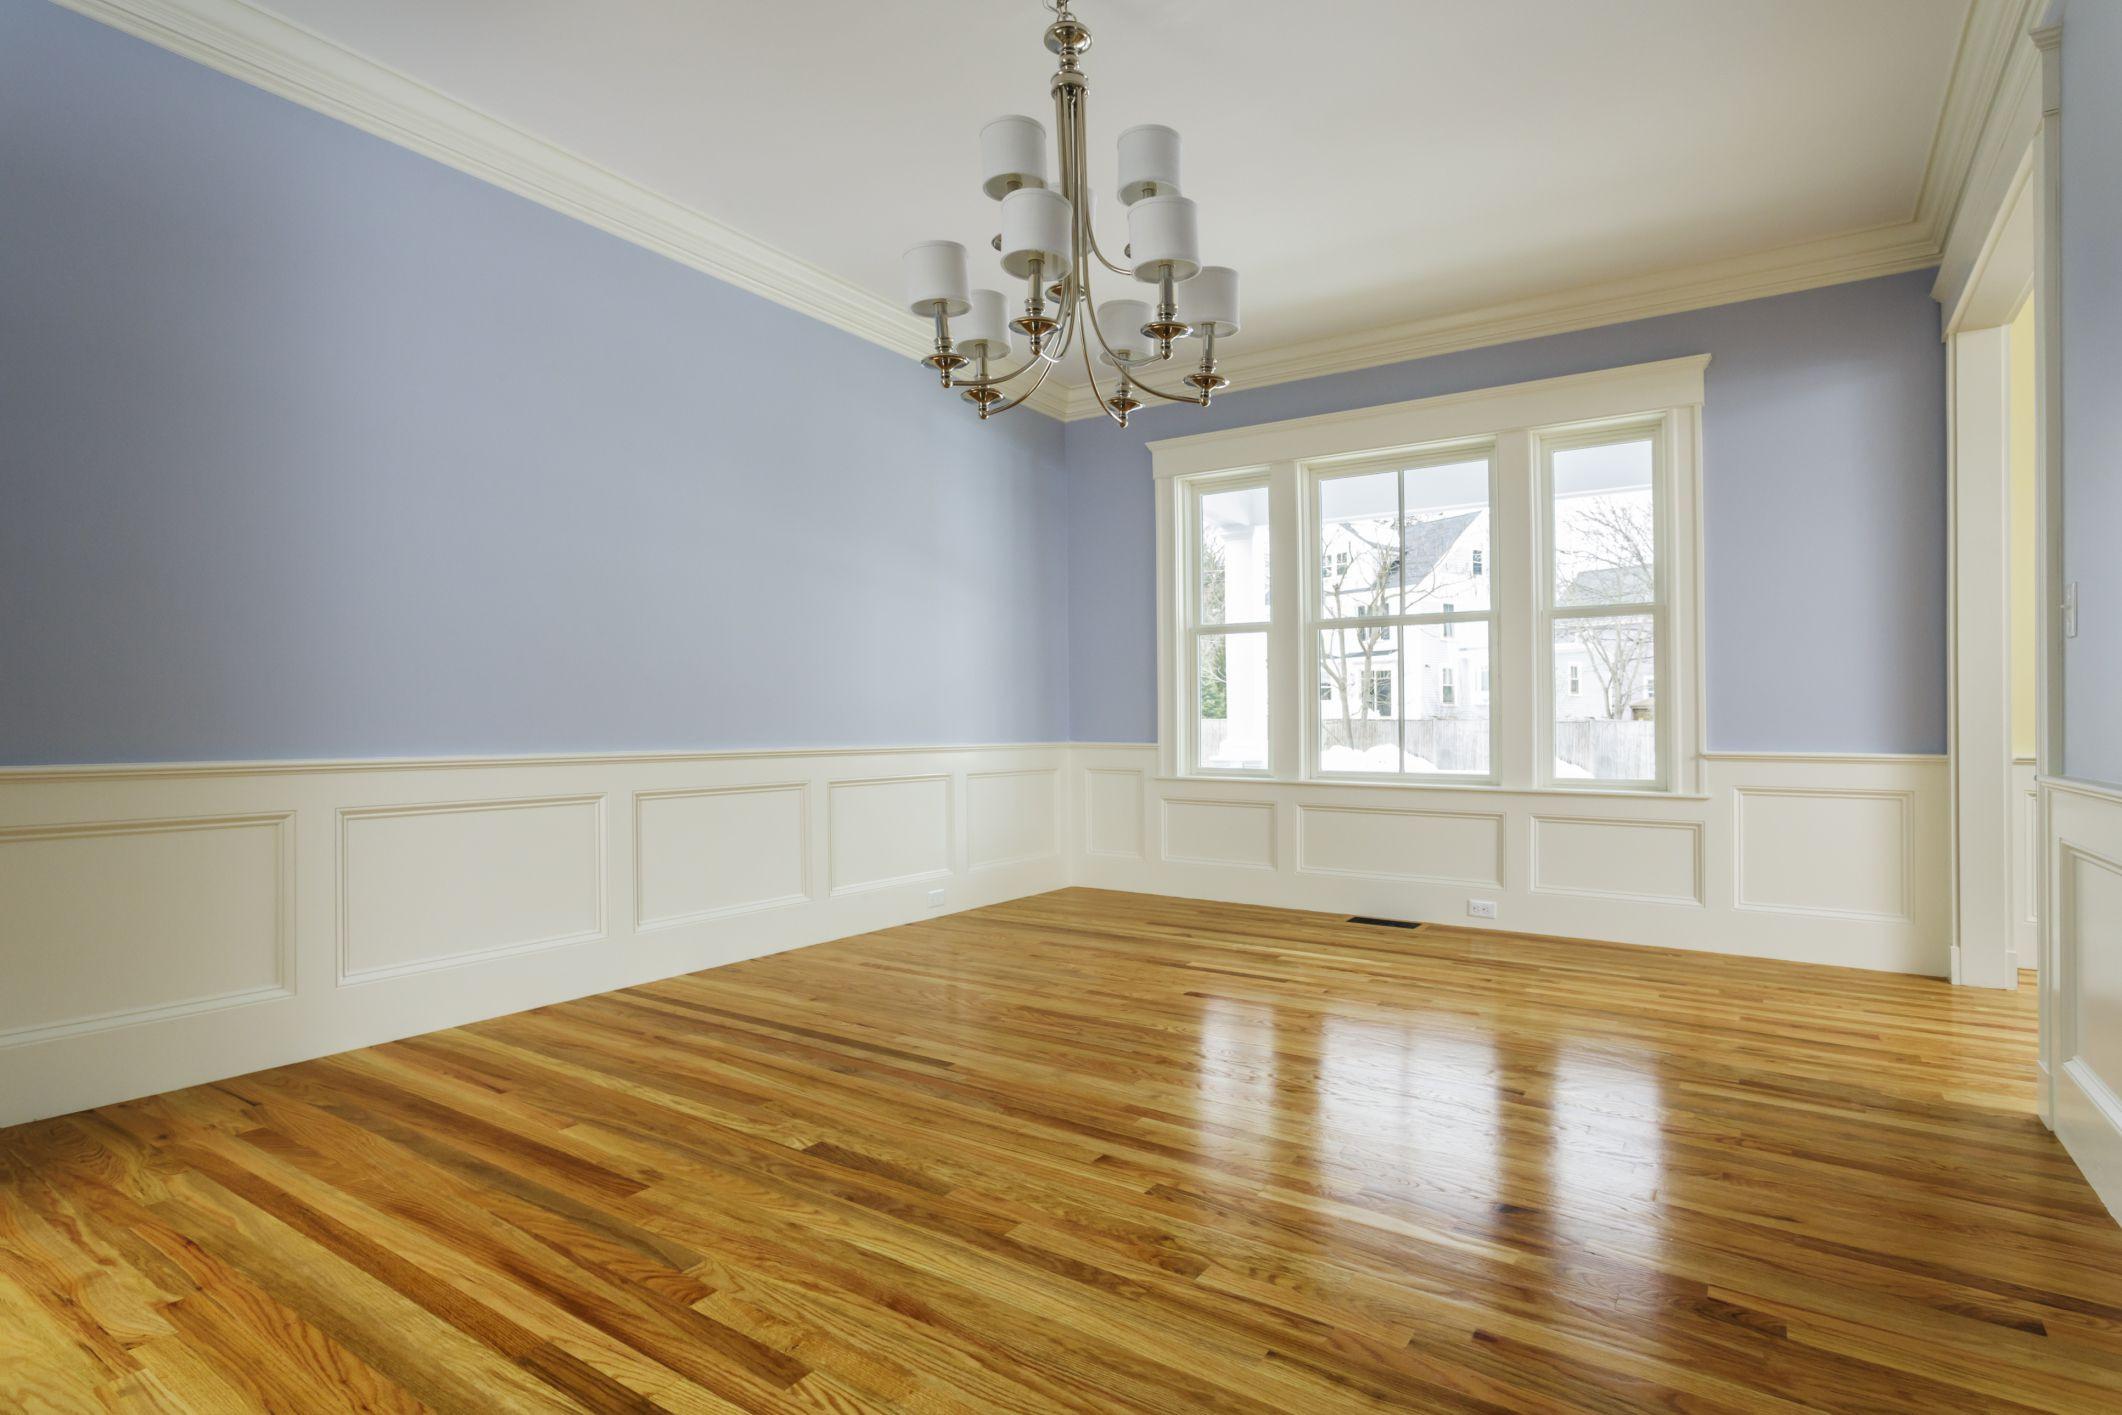 11 Lovable Hardwood Flooring Denver Co 2021 free download hardwood flooring denver co of the cost to refinish hardwood floors intended for 168686572 highres 56a2fd773df78cf7727b6cb3